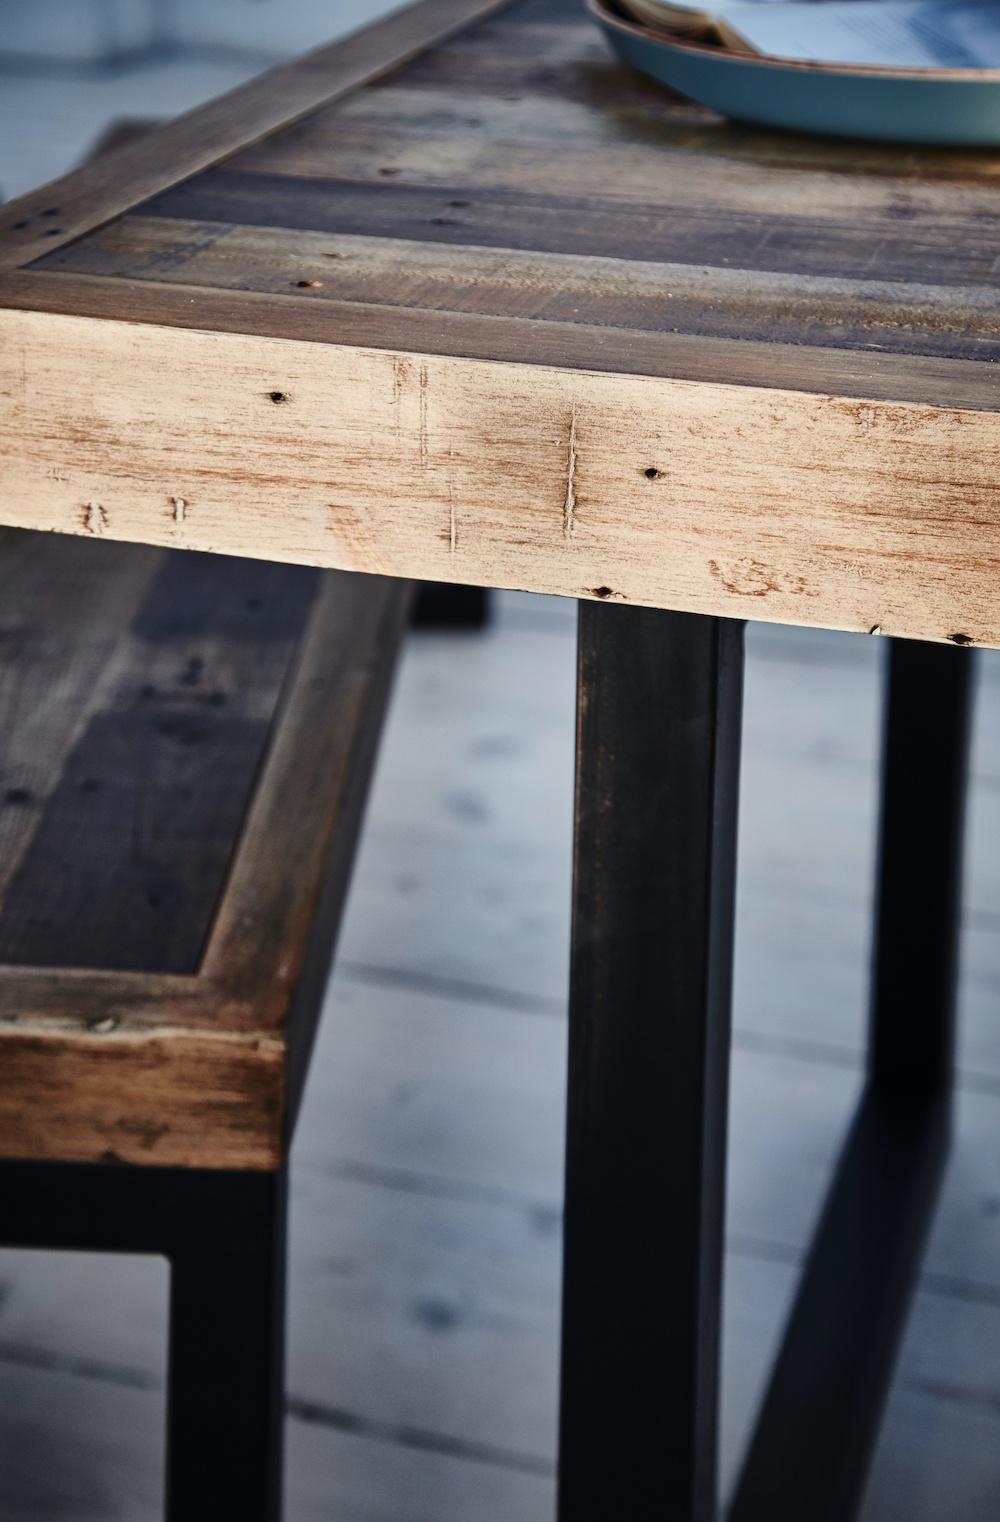 Newland dining table leg